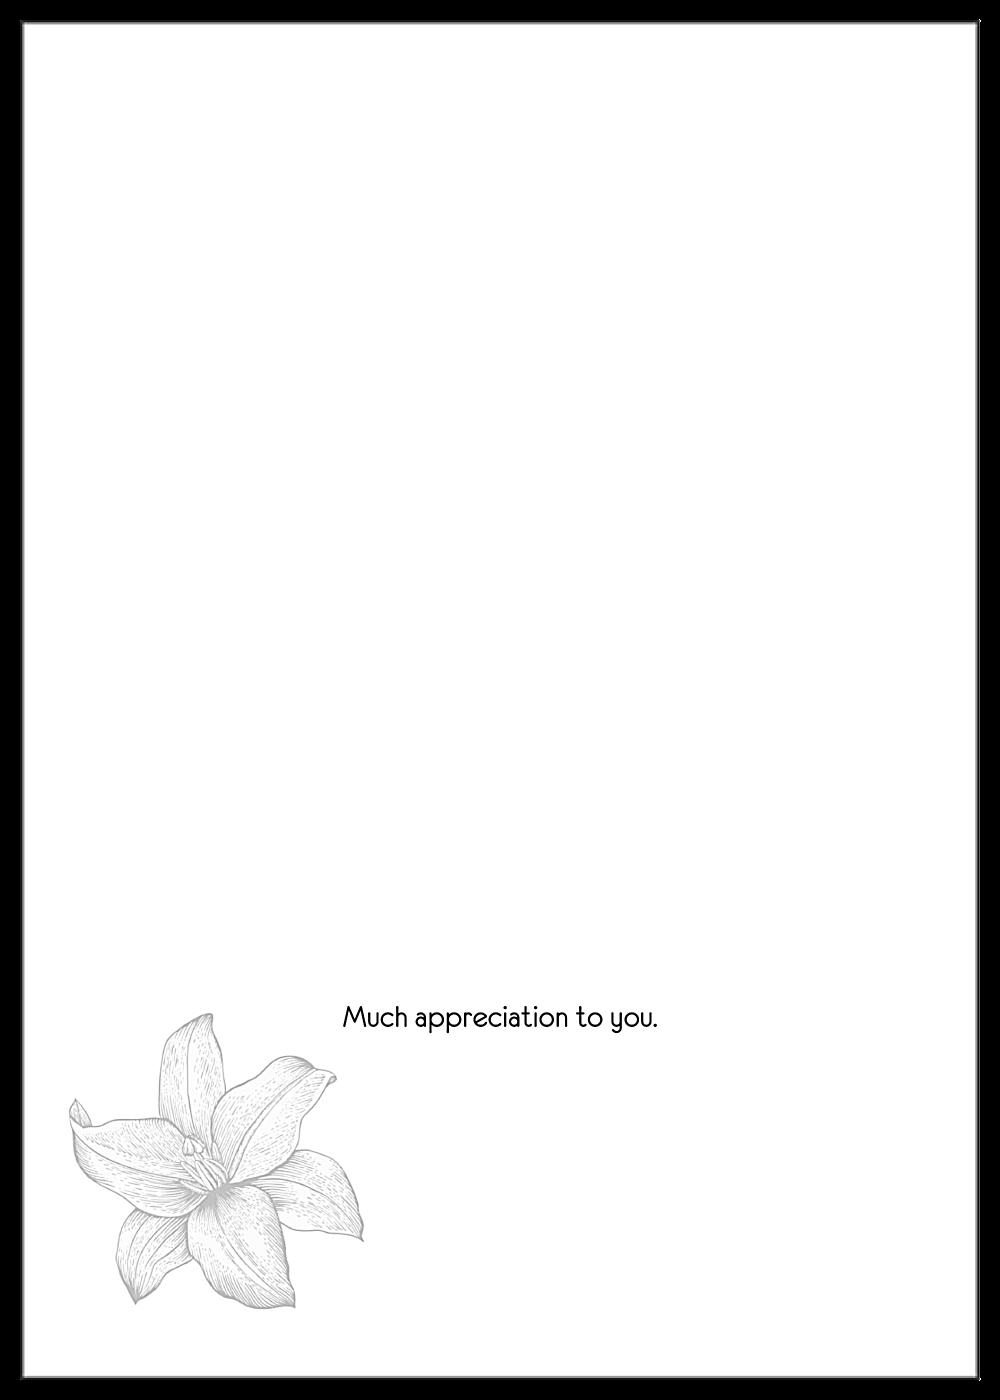 Lily Flower Thanks back - Greeting Cards Maker